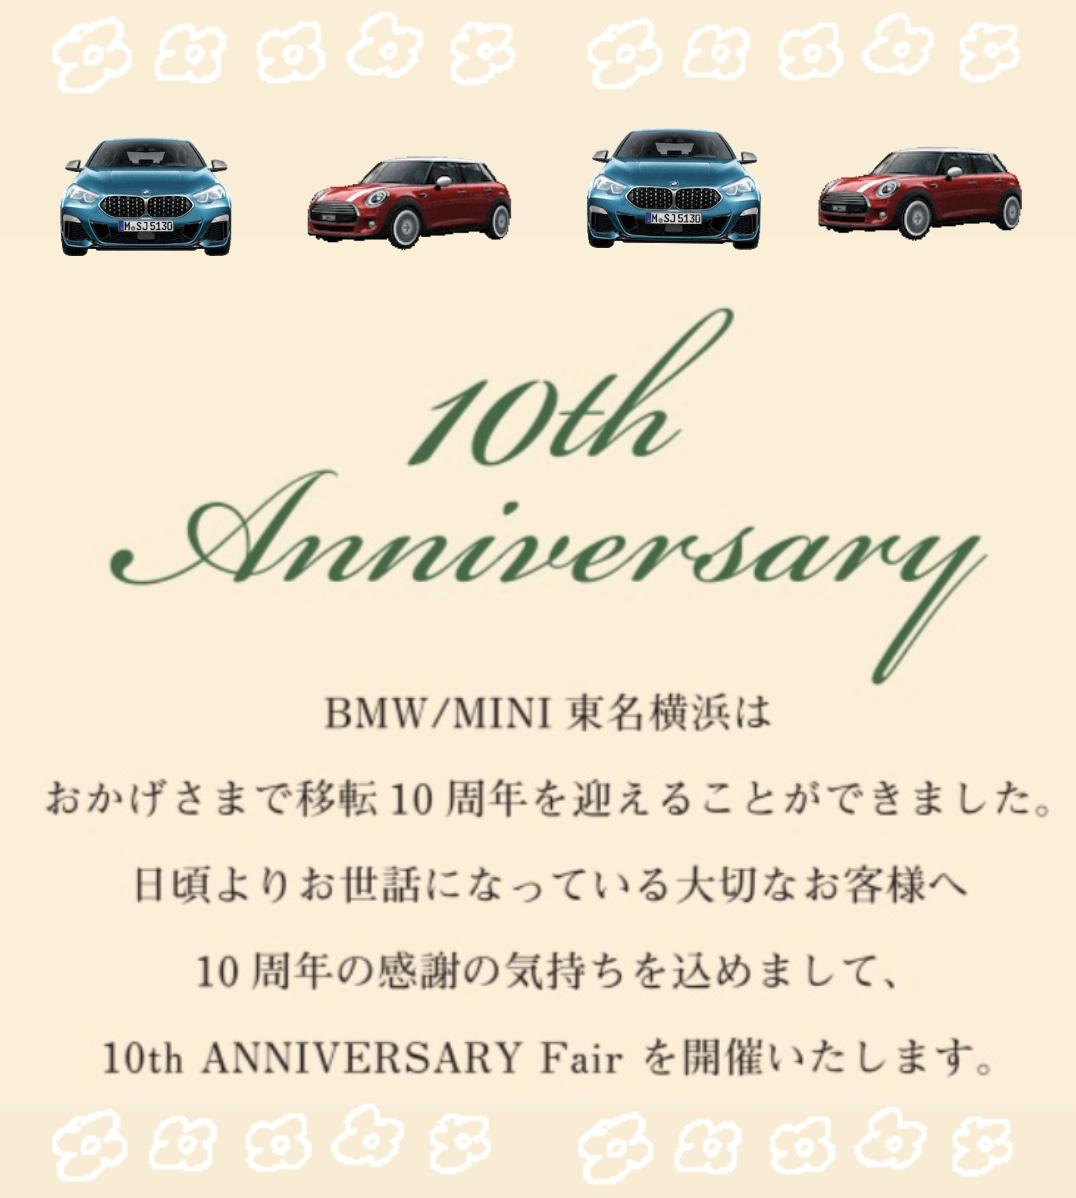 f:id:tomeiyokohama-bmw-mini:20210511155453p:plain